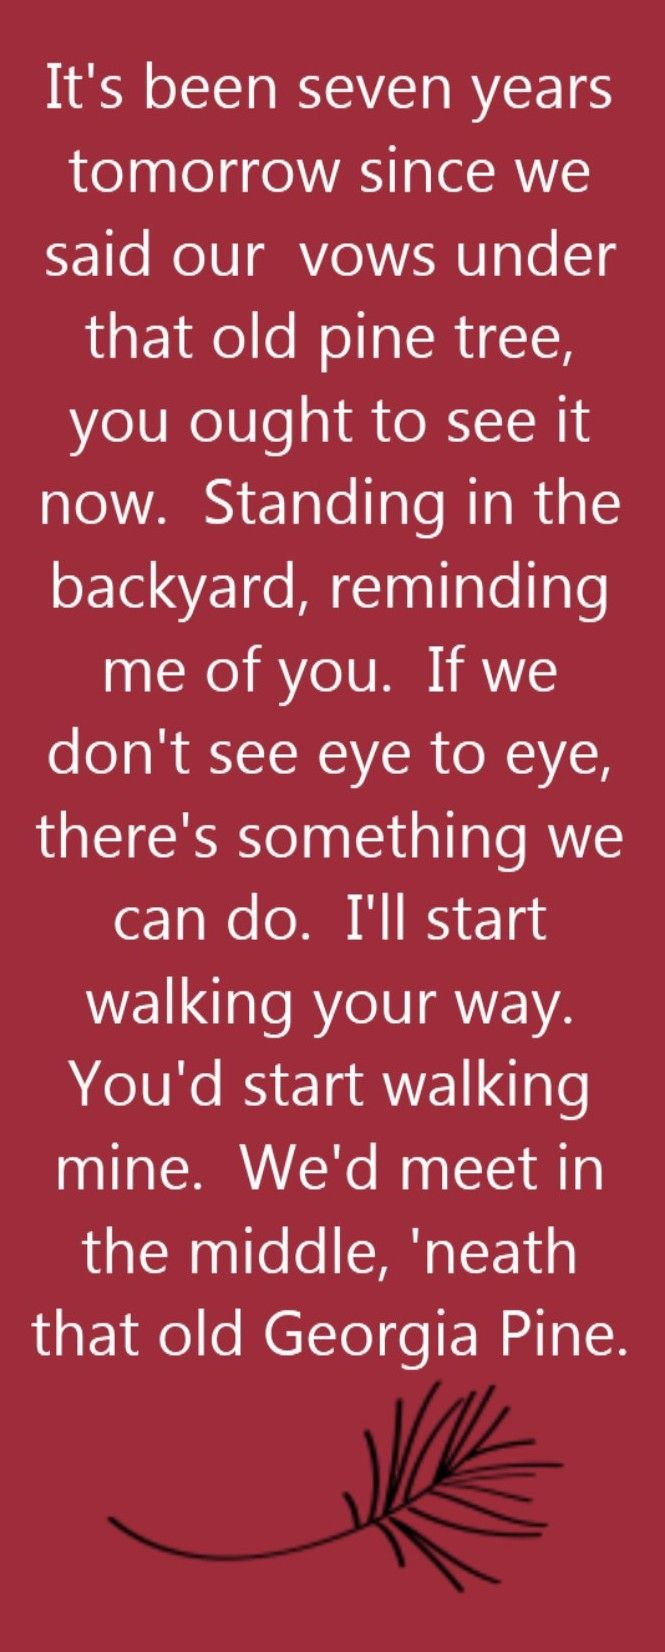 Diamond Rio - Meet You in the Middle - song lyrics, song quotes, songs, music lyrics, music quotes,